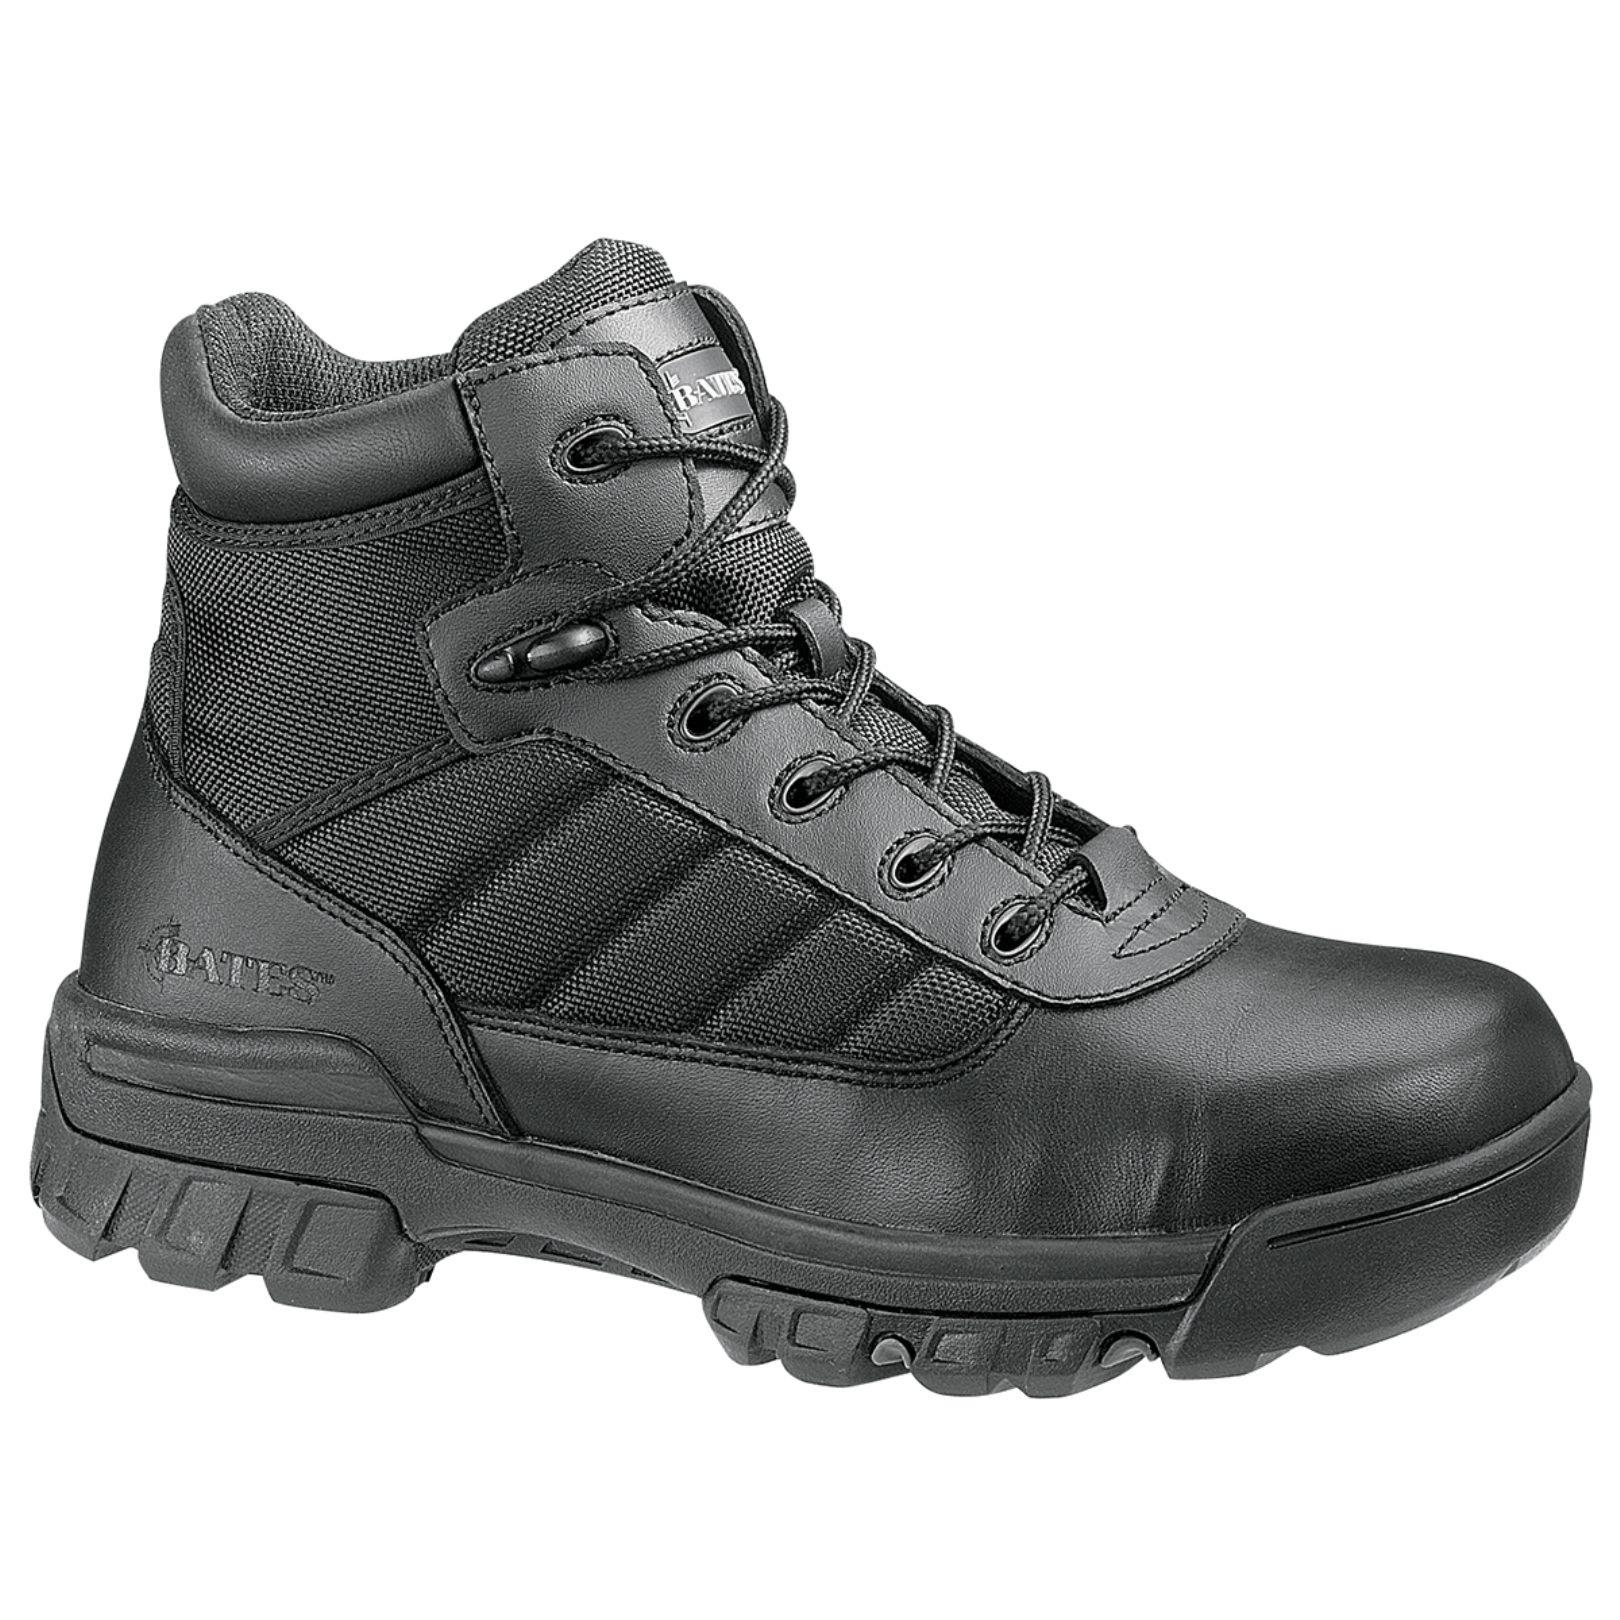 Bates mens ultralites 5 soft toe work boot e02262